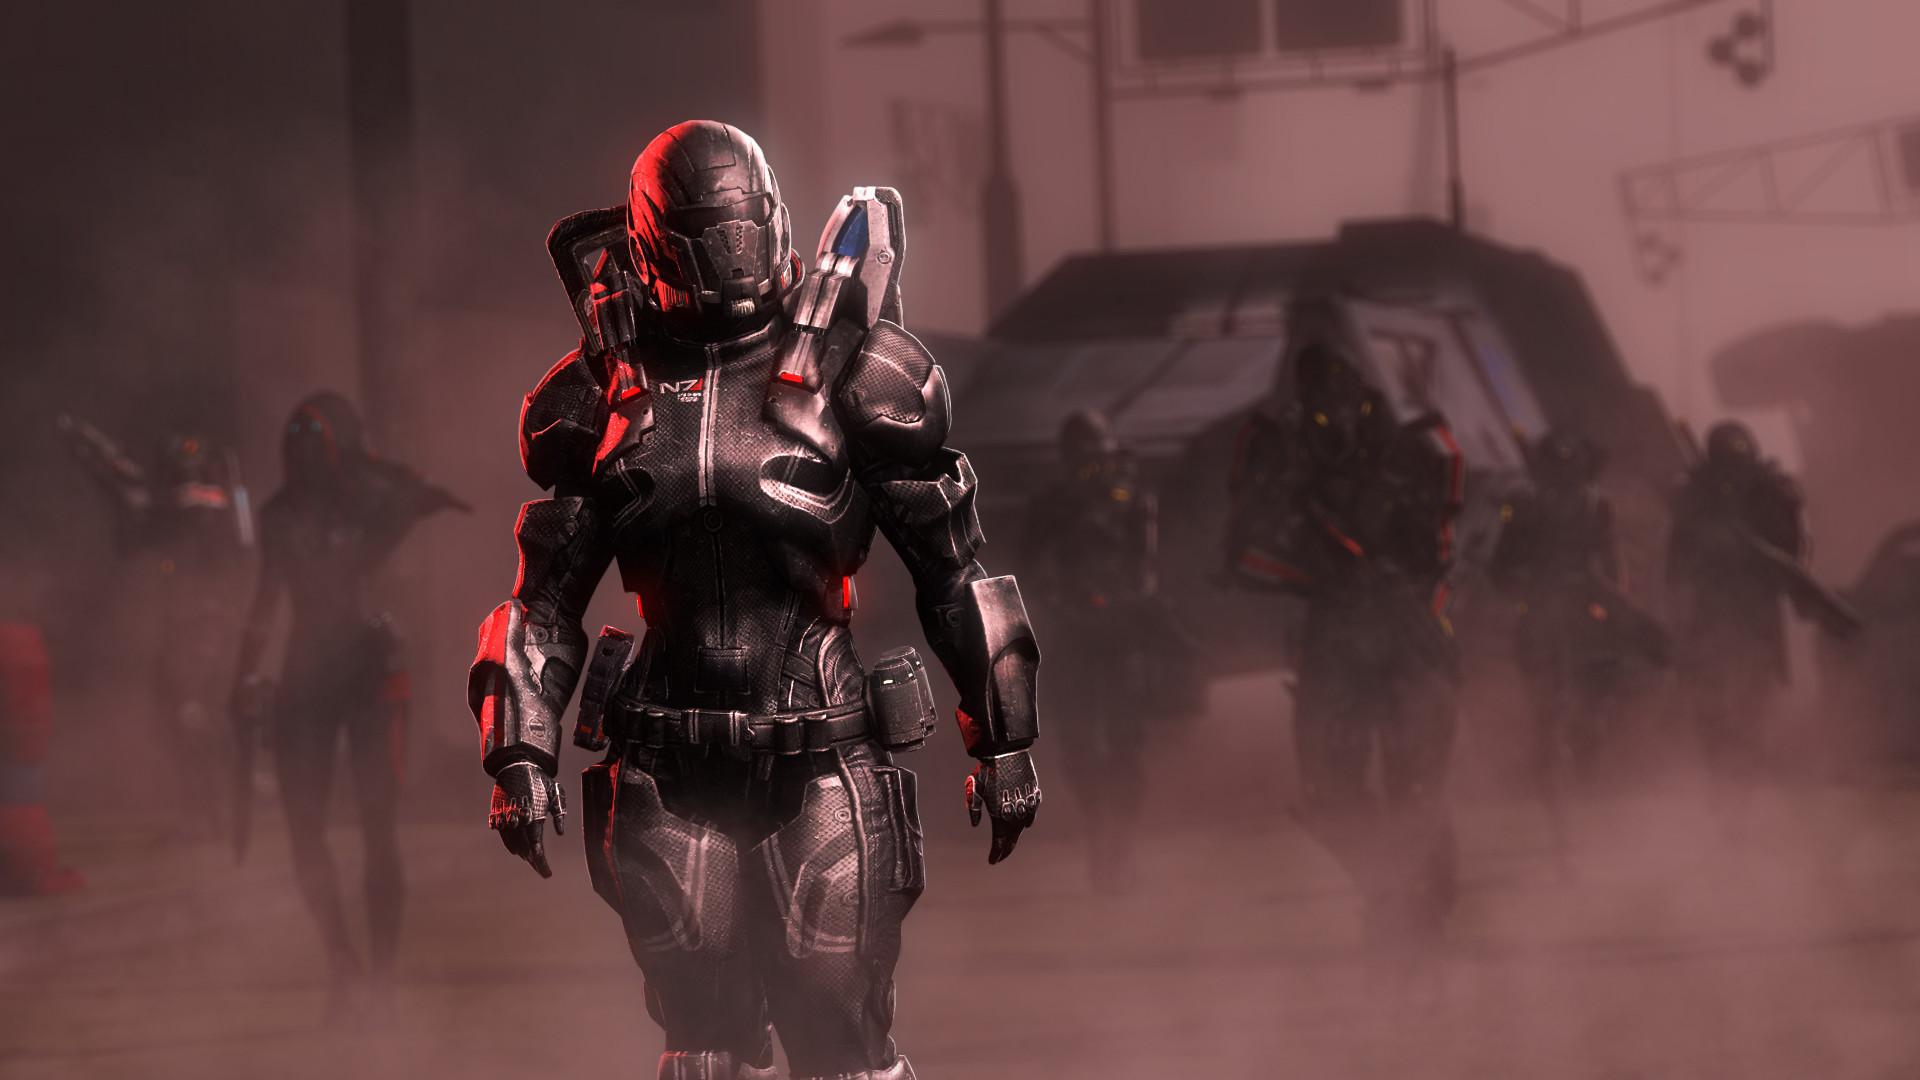 Fallout HD wallpaper – Power armor by umi-no-mizu on DeviantArt